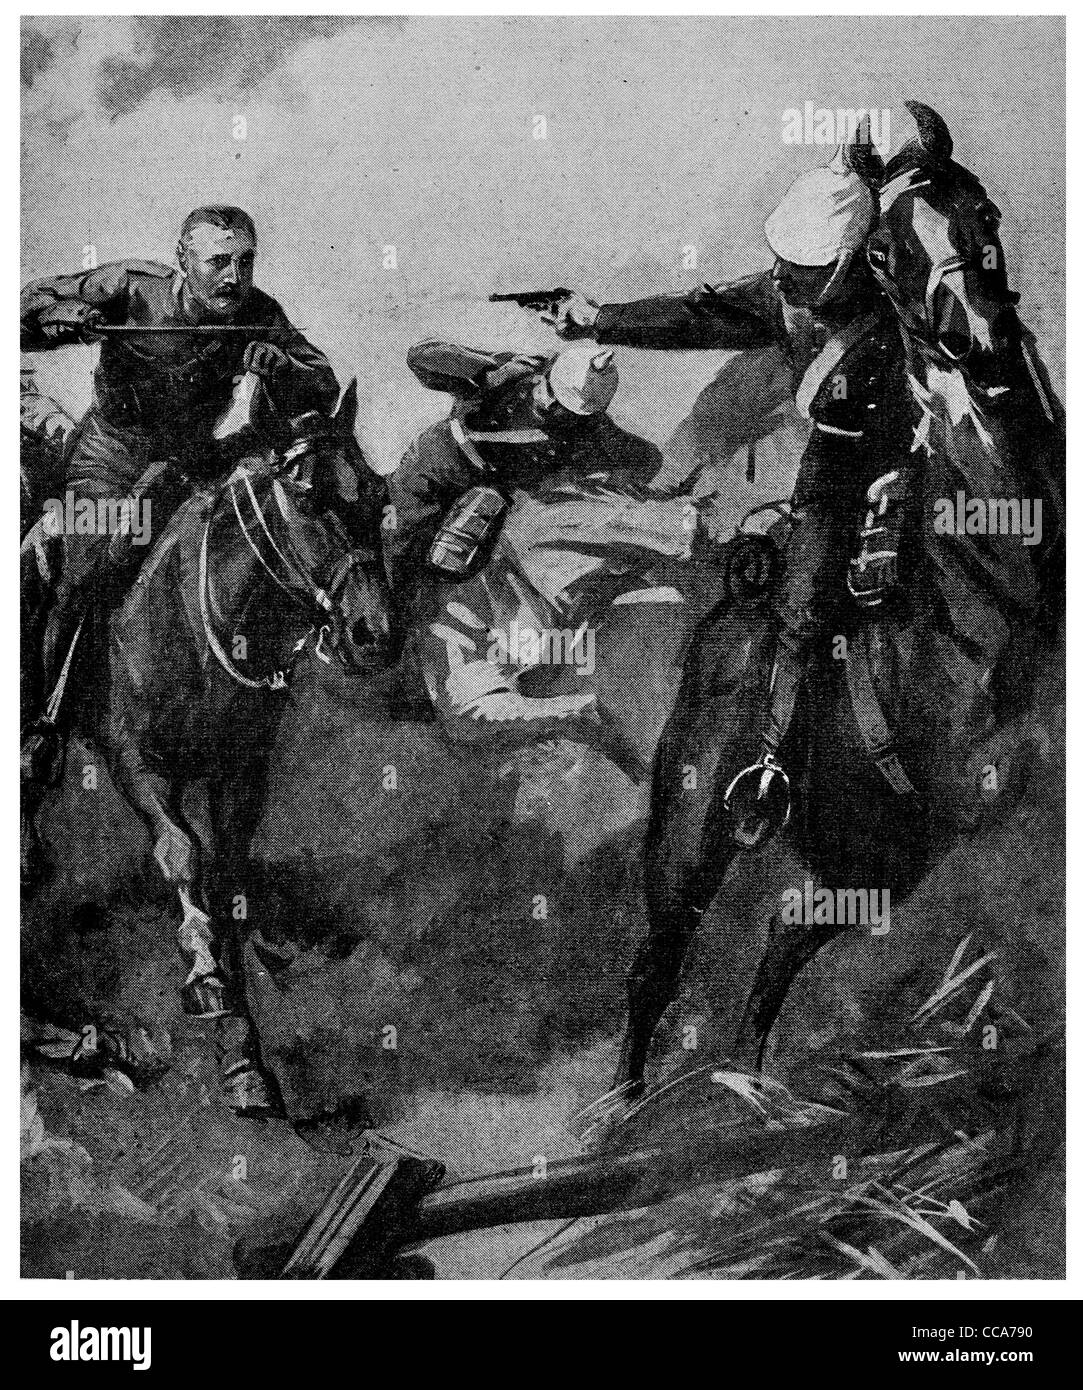 1914 British cavalry against German Uhlans cavalry charge Uhlan horse horses saber pistol lance battle field - Stock Image